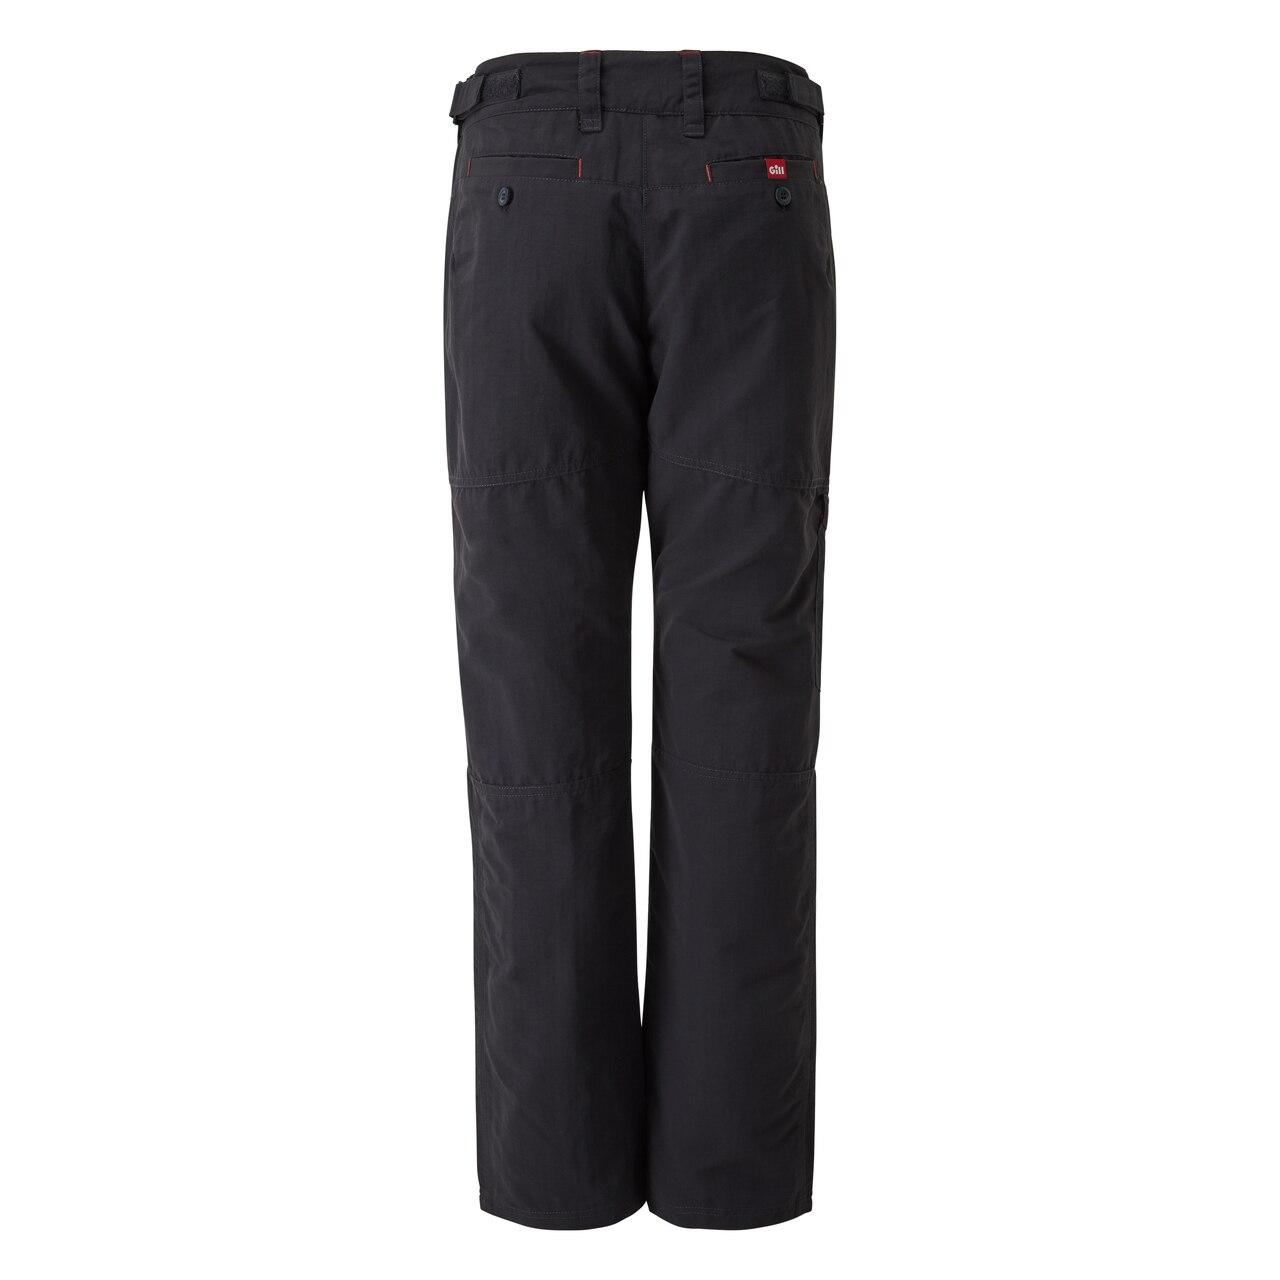 Women's UV Tec Trousers - UV014W-GRA01-3.jpg